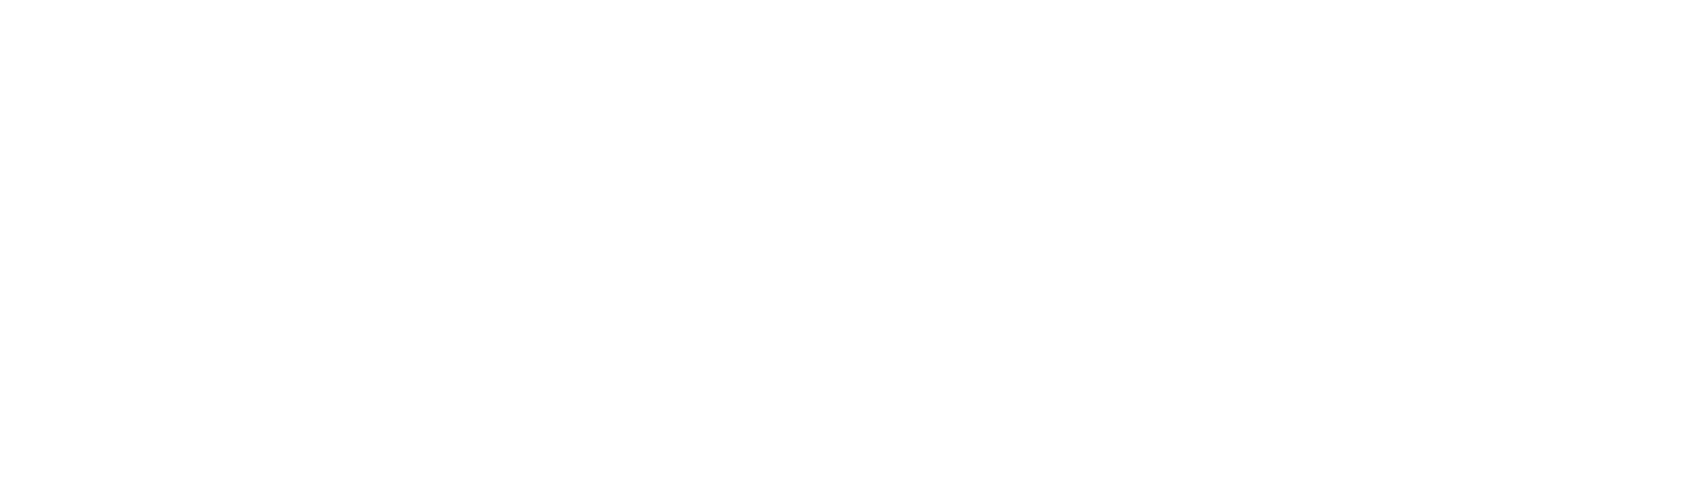 Plywood People